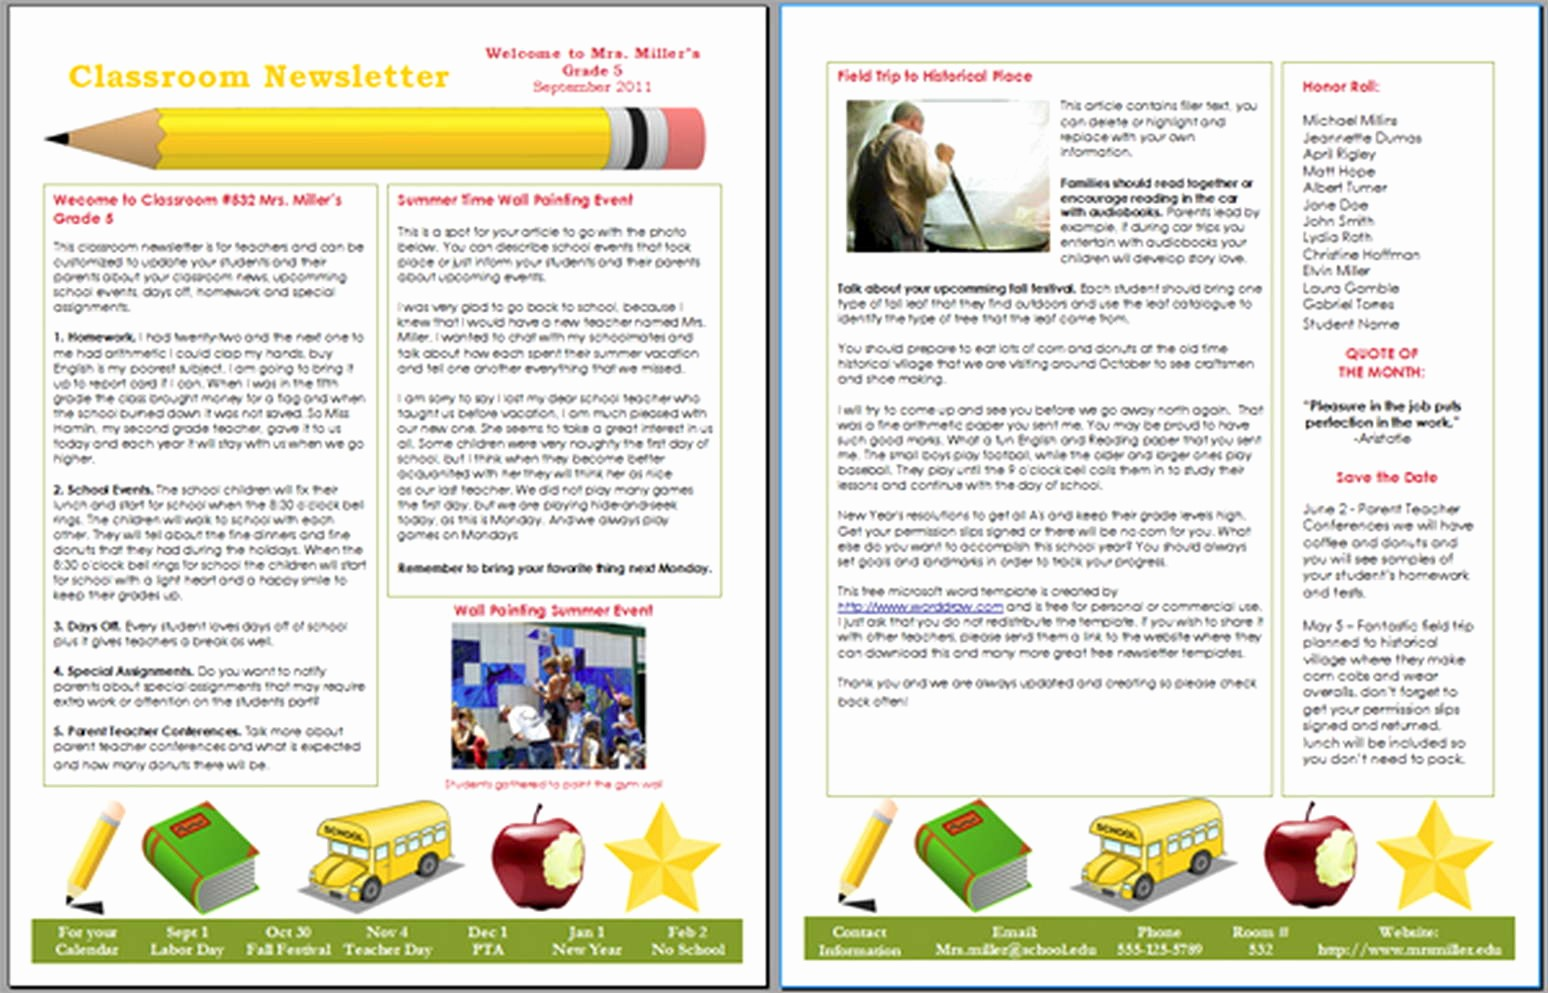 Microsoft Word Newsletter Templates Free Luxury School Newsletter Templates